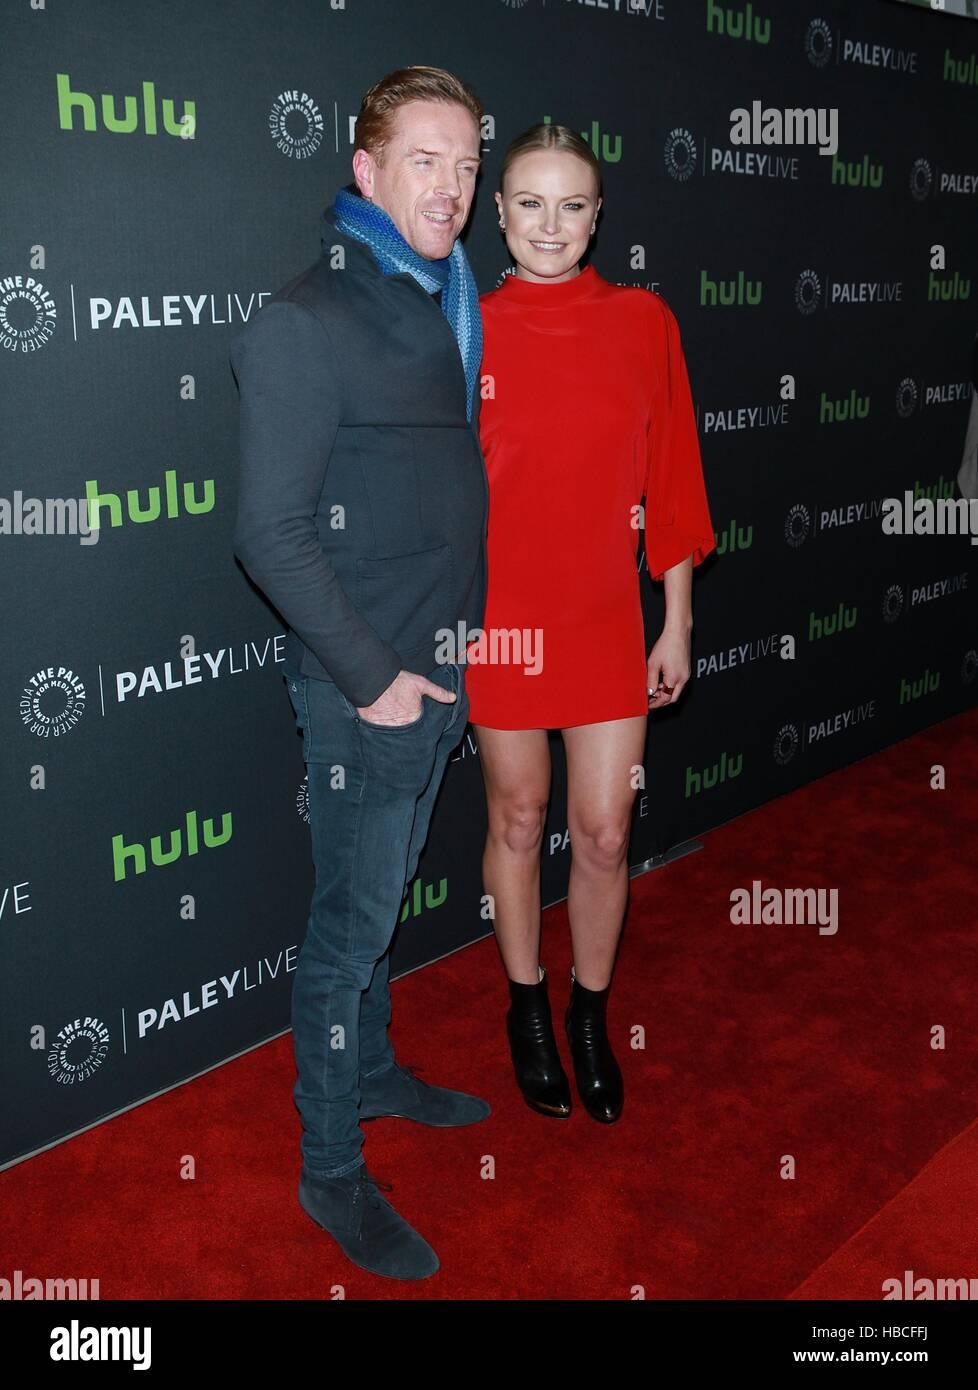 New York, USA. 5th December, 2016. Damian Lewis and Malin Akerman at 'PaleyLive NY Billions' at The Paley - Stock Image